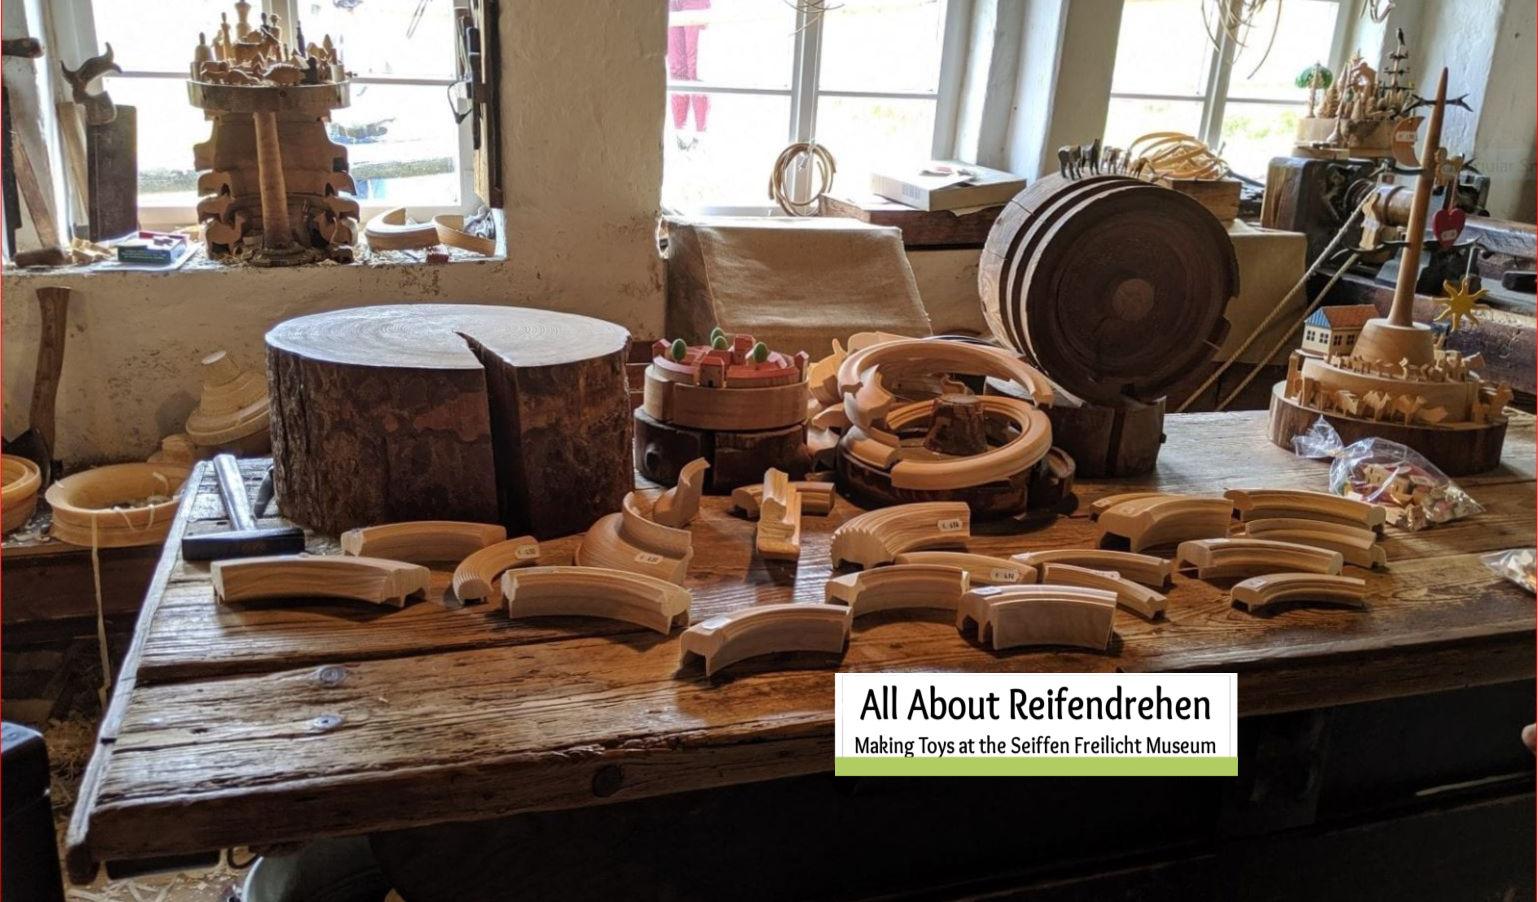 What is Reifendrehen- Making Toys at the Seiffen Freilicht Museum